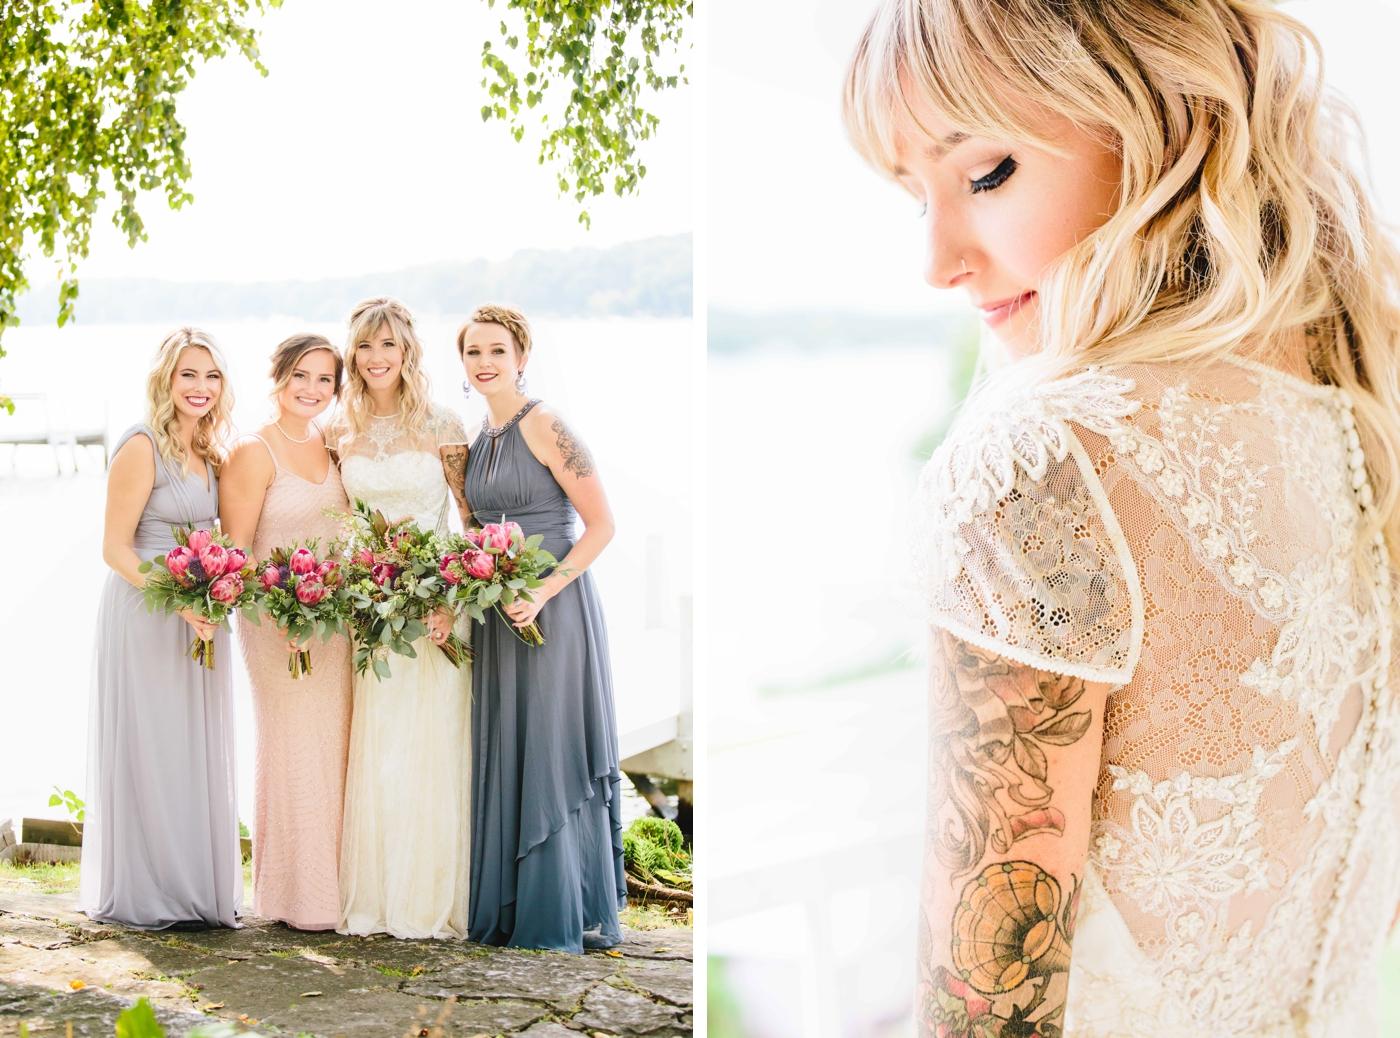 chicago-fine-art-wedding-photography-chriskelsey4